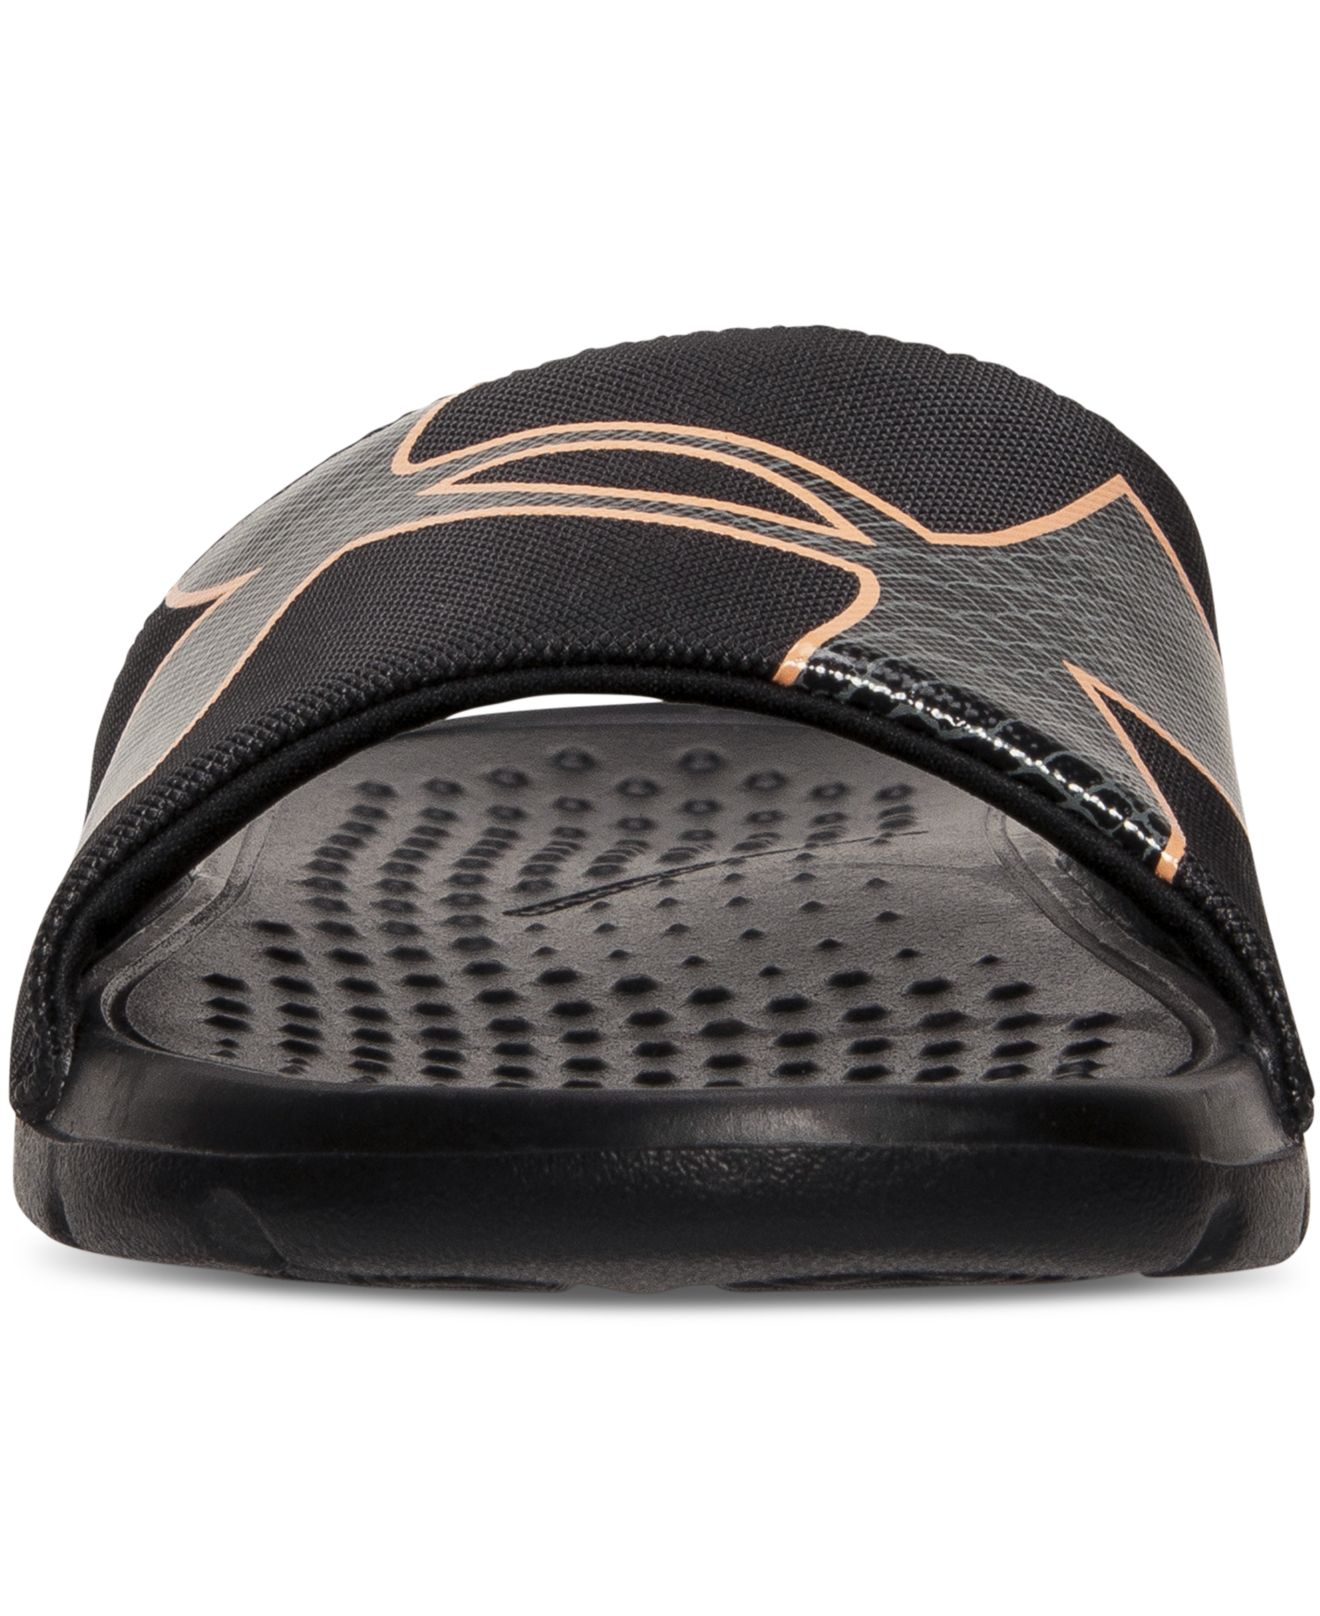 62c4ffbac5 Under Armour Black Women's Strike Rock Slide Sandals From Finish Line